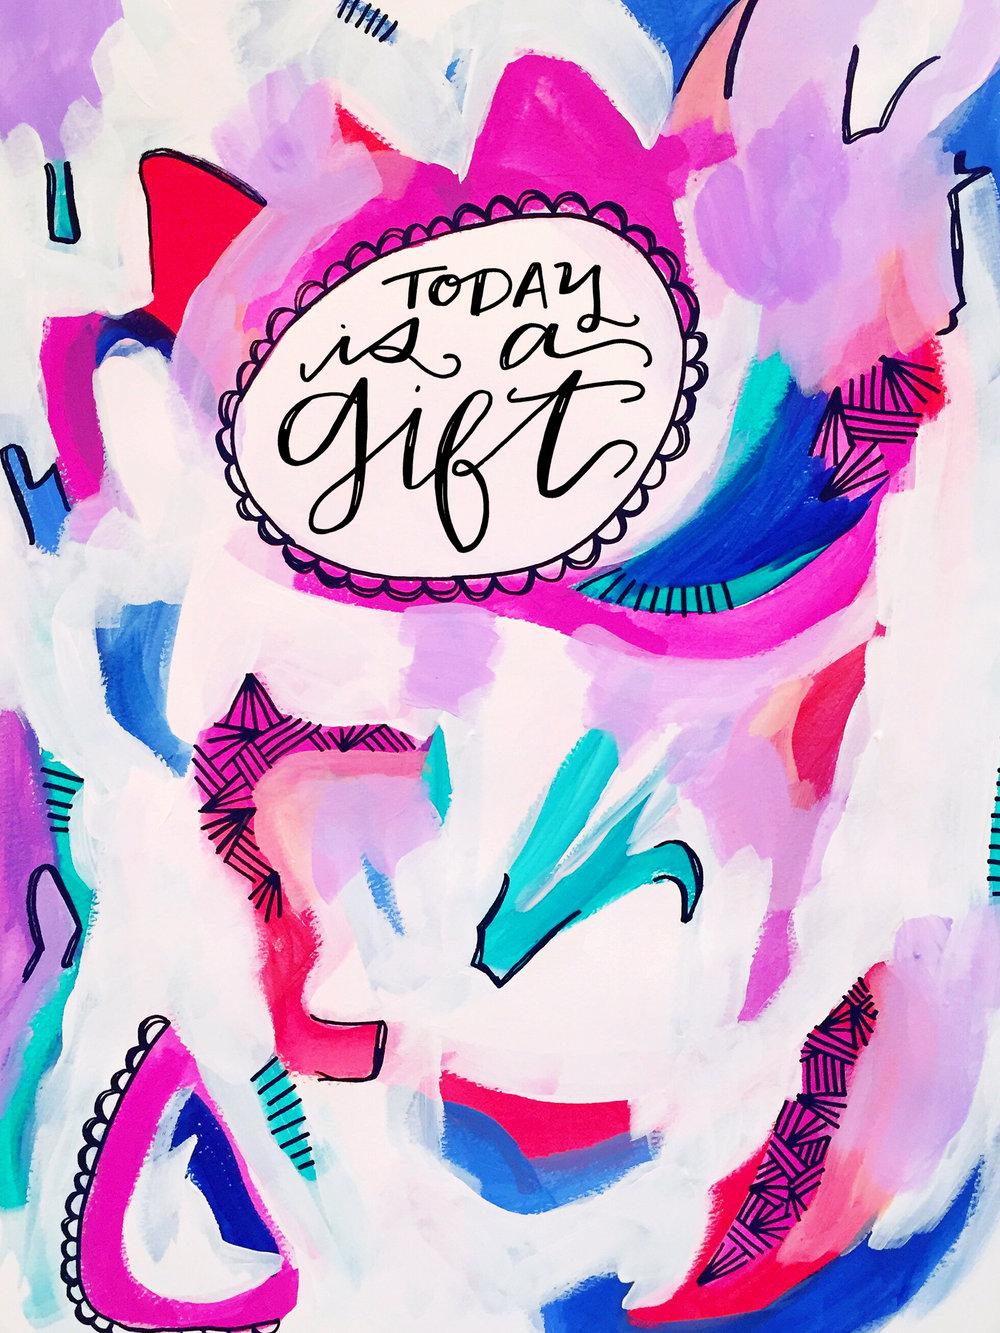 1/11/16: Gift